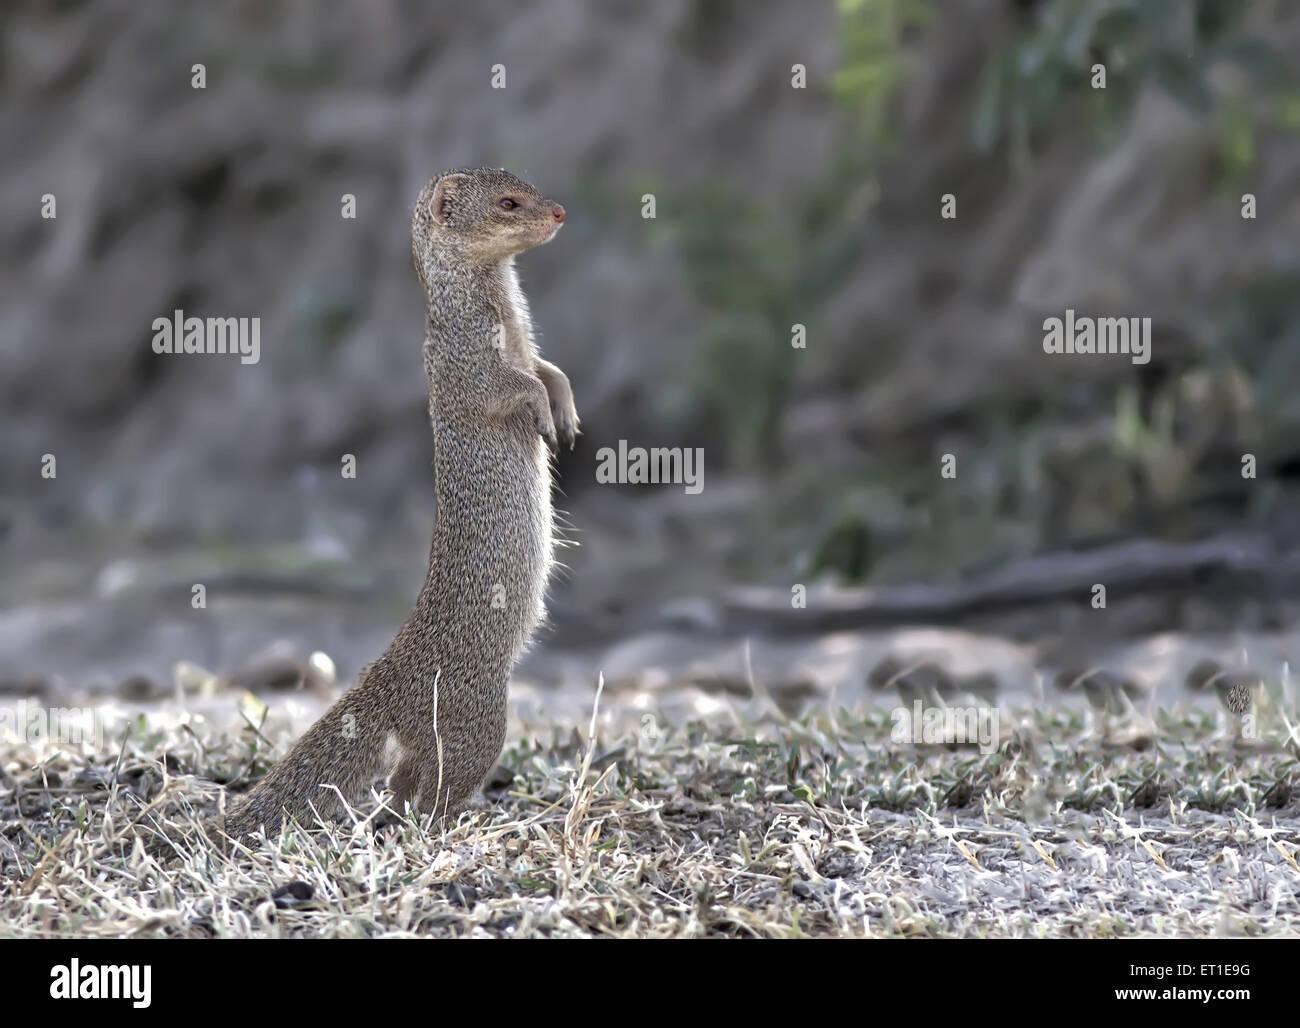 La mangosta en Rajastán, India Imagen De Stock